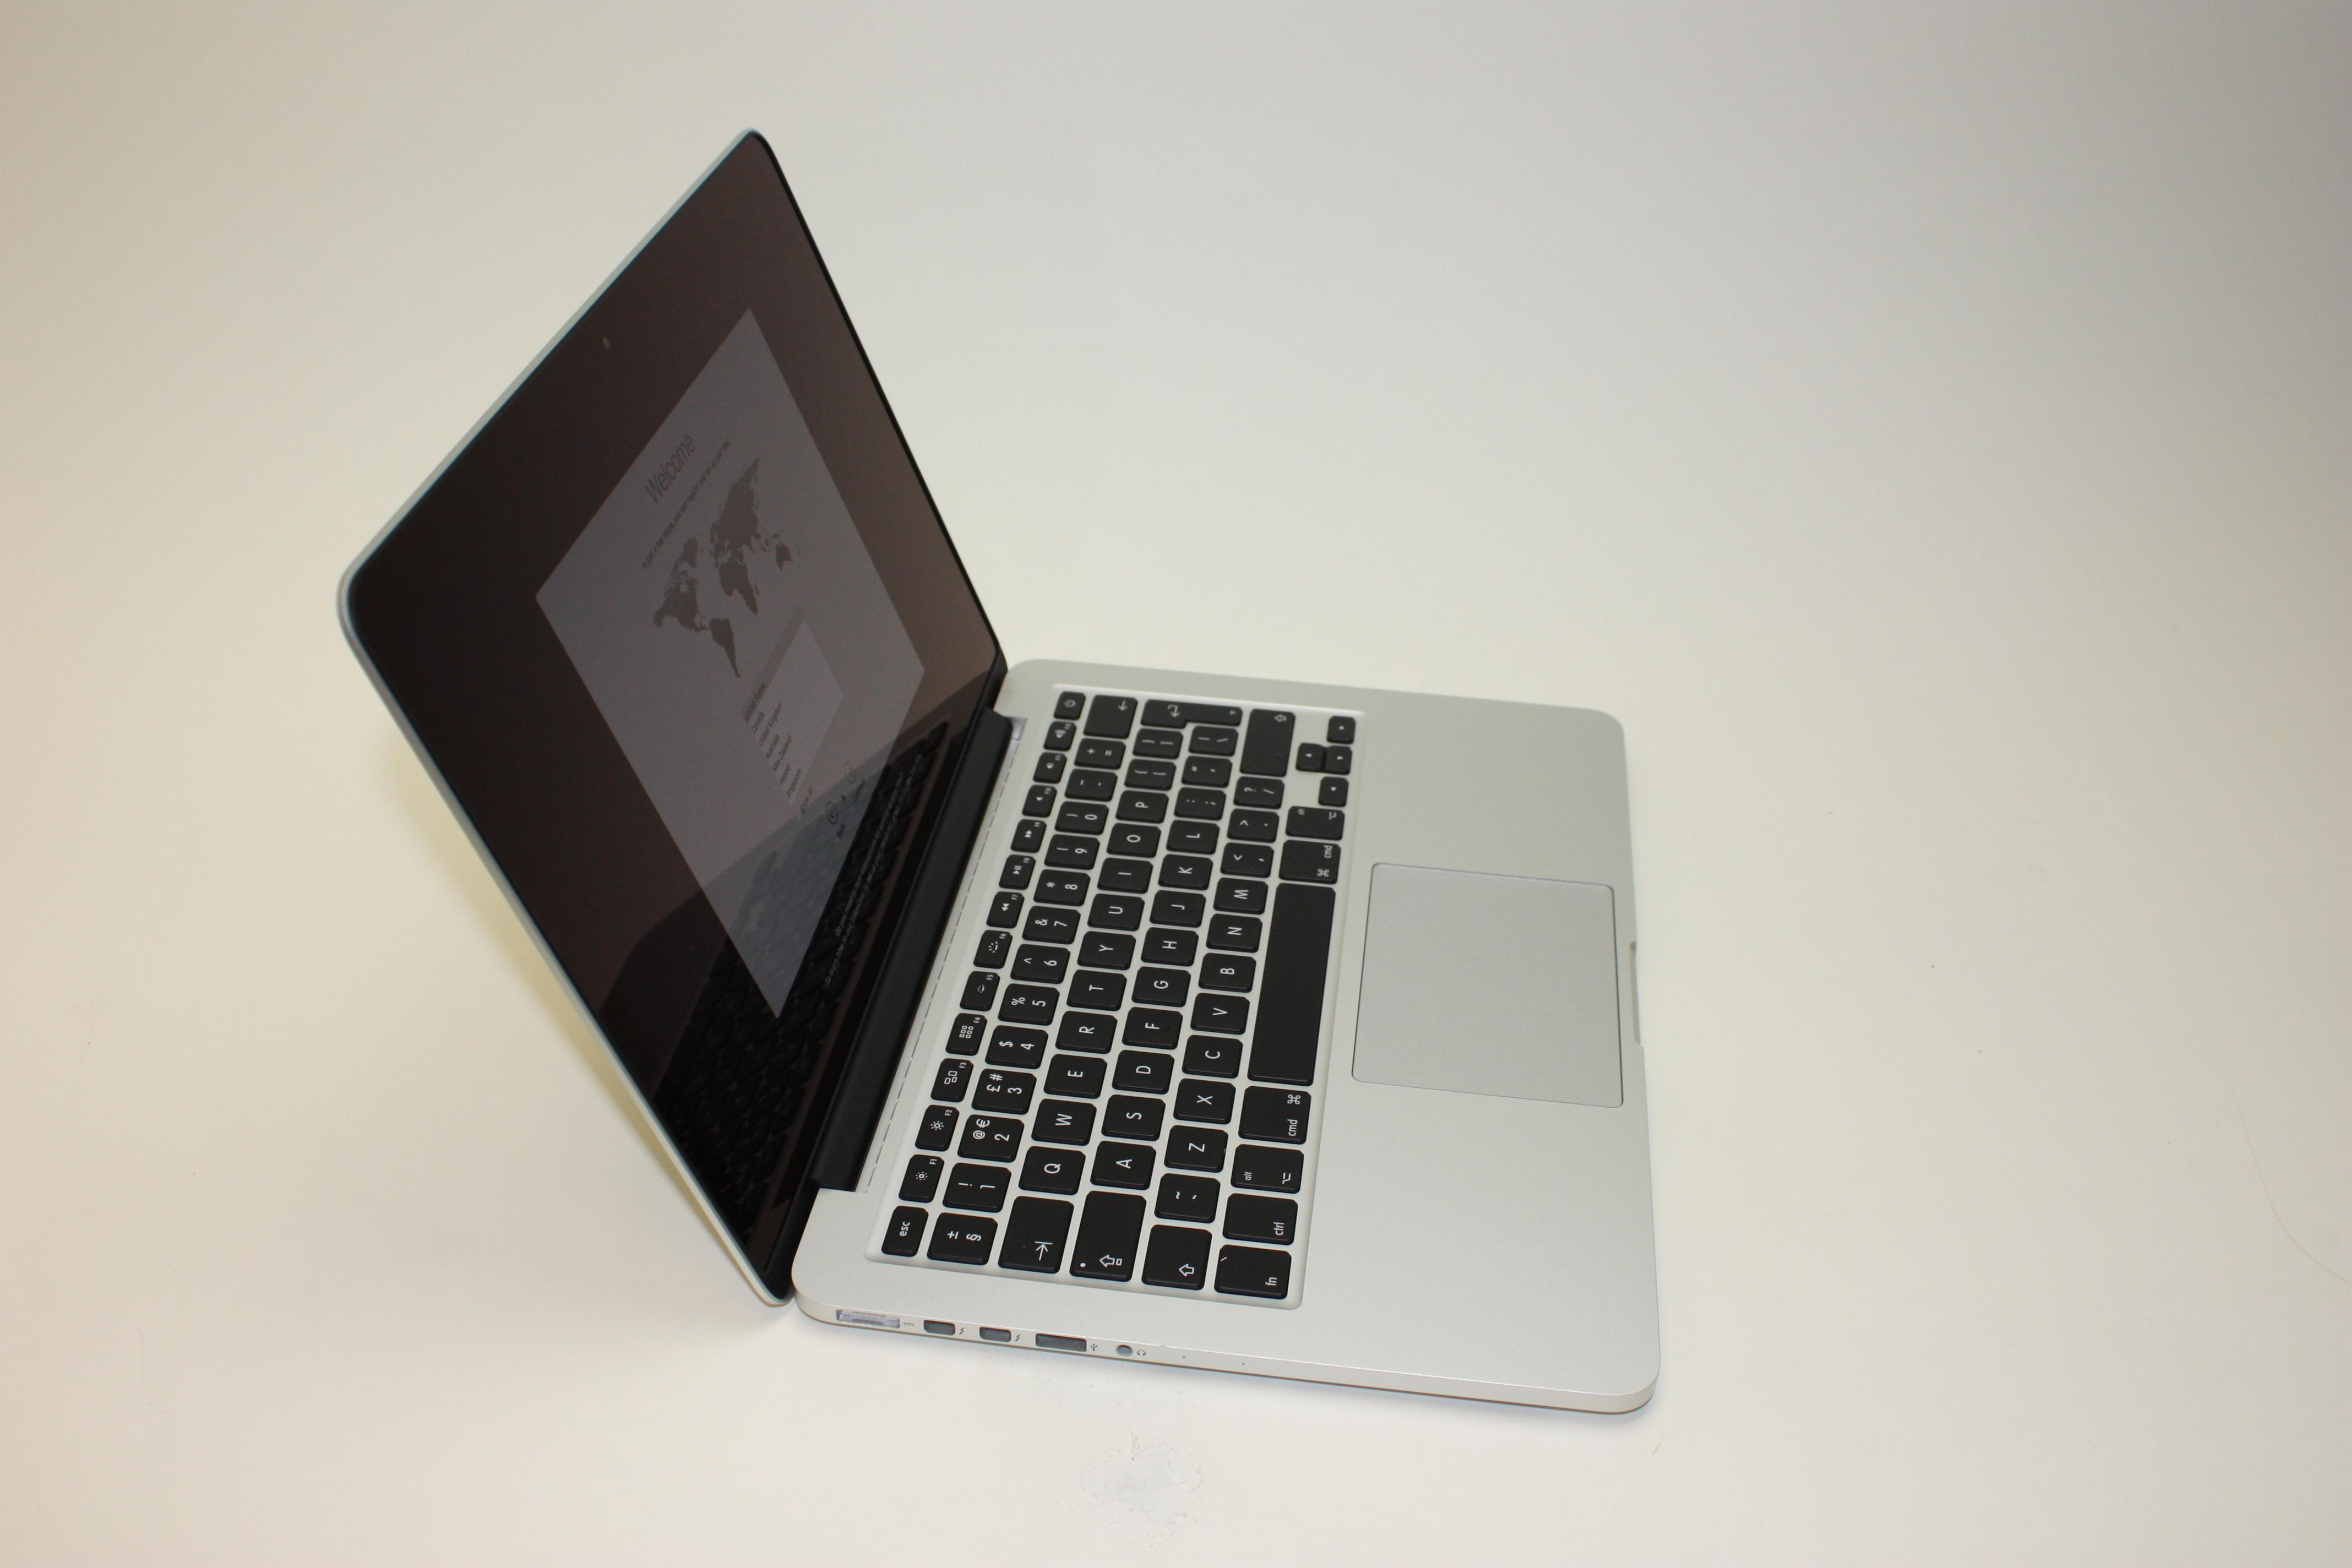 MacBook Pro 13-inch Retina, 2.7 GHz Core i5 (I5-5257U), 8 GB 1867 MHz DDR3, 128 GB Flash Storage, image 3